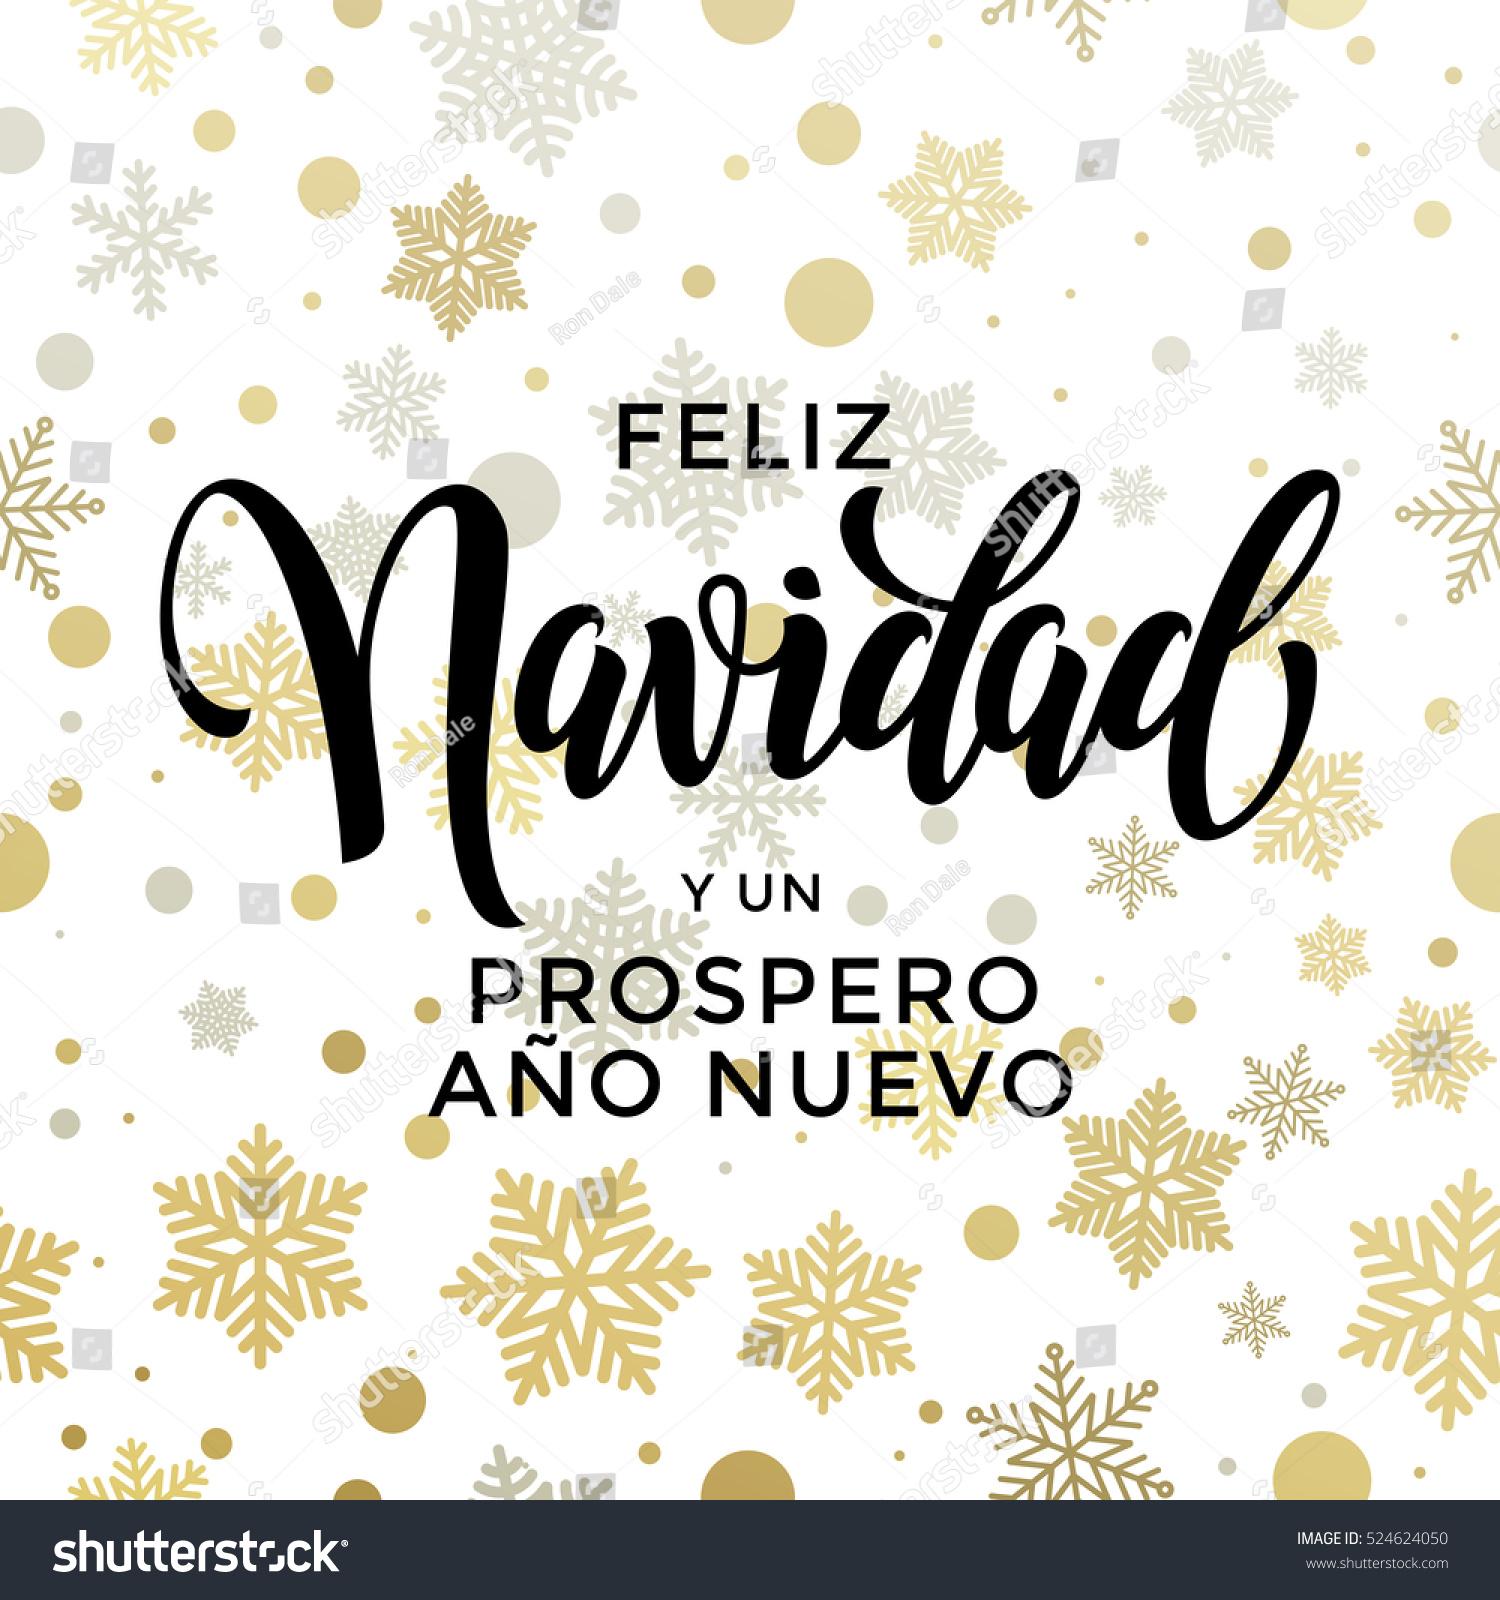 New Year Spanish Golden Text Prospero Stock Vector Royalty Free